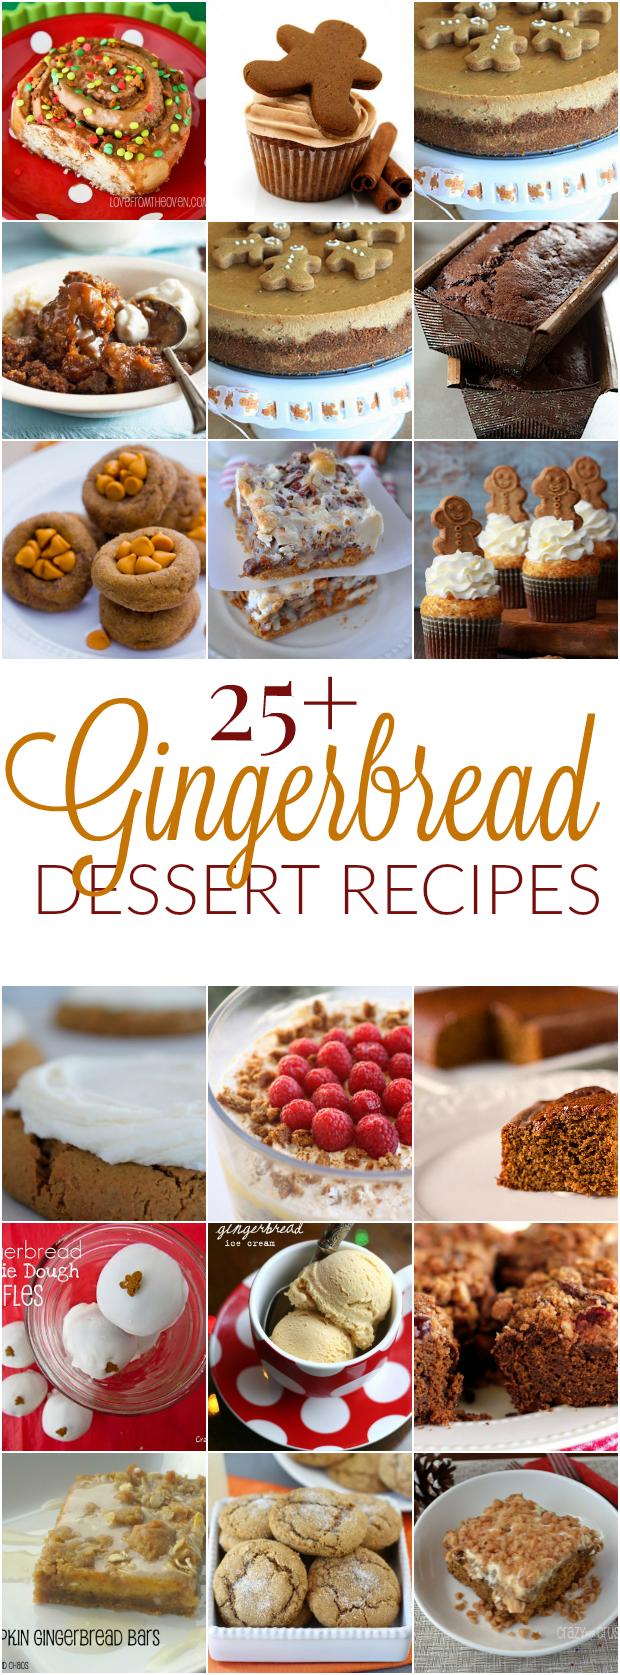 25+ Gingerbread Dessert Recipes